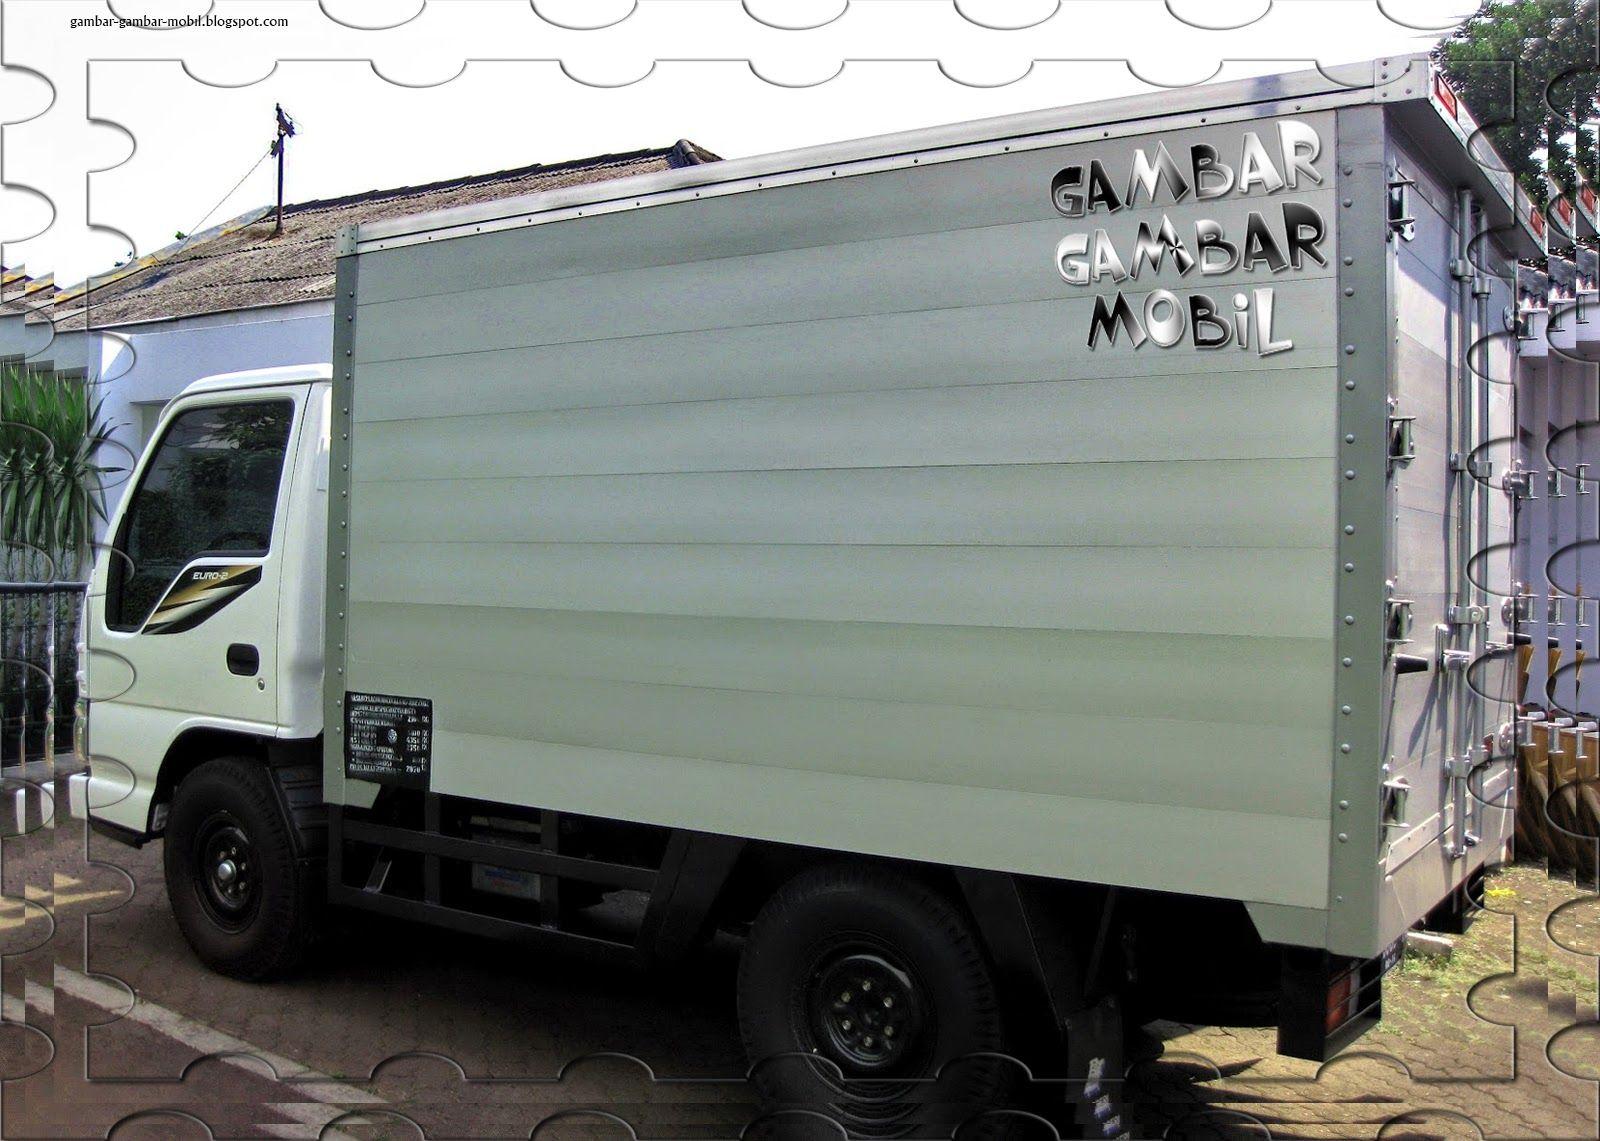 86 Gambar Mobil Truk Box HD Terbaru